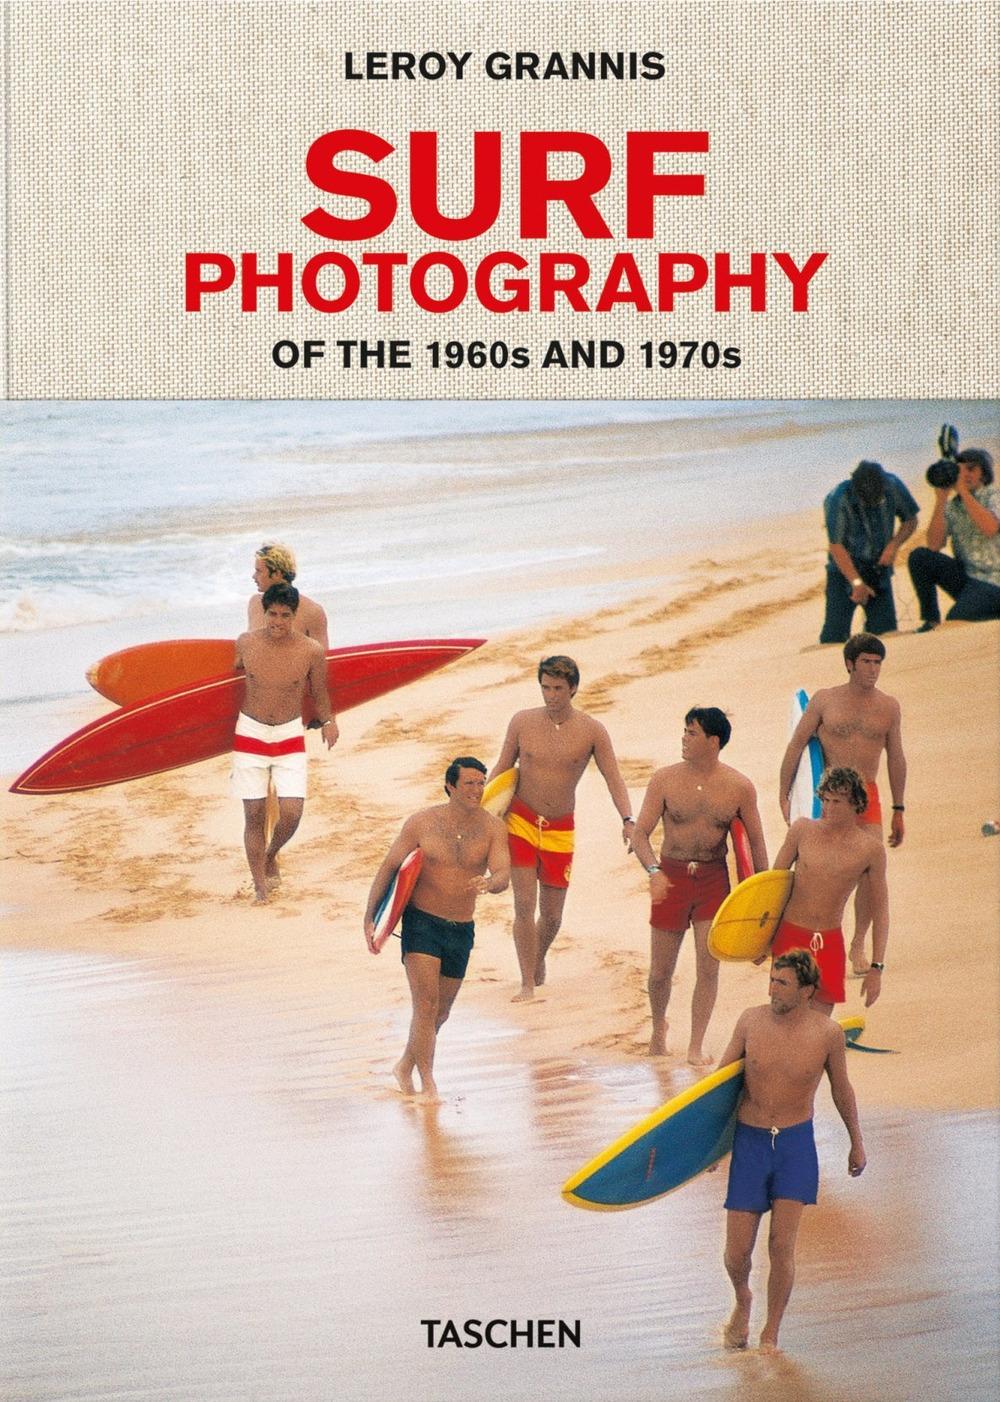 LeRoy Grannis. Surf Photography of the 1960s and 1970s. Ediz. italiana, spagnola e portoghese